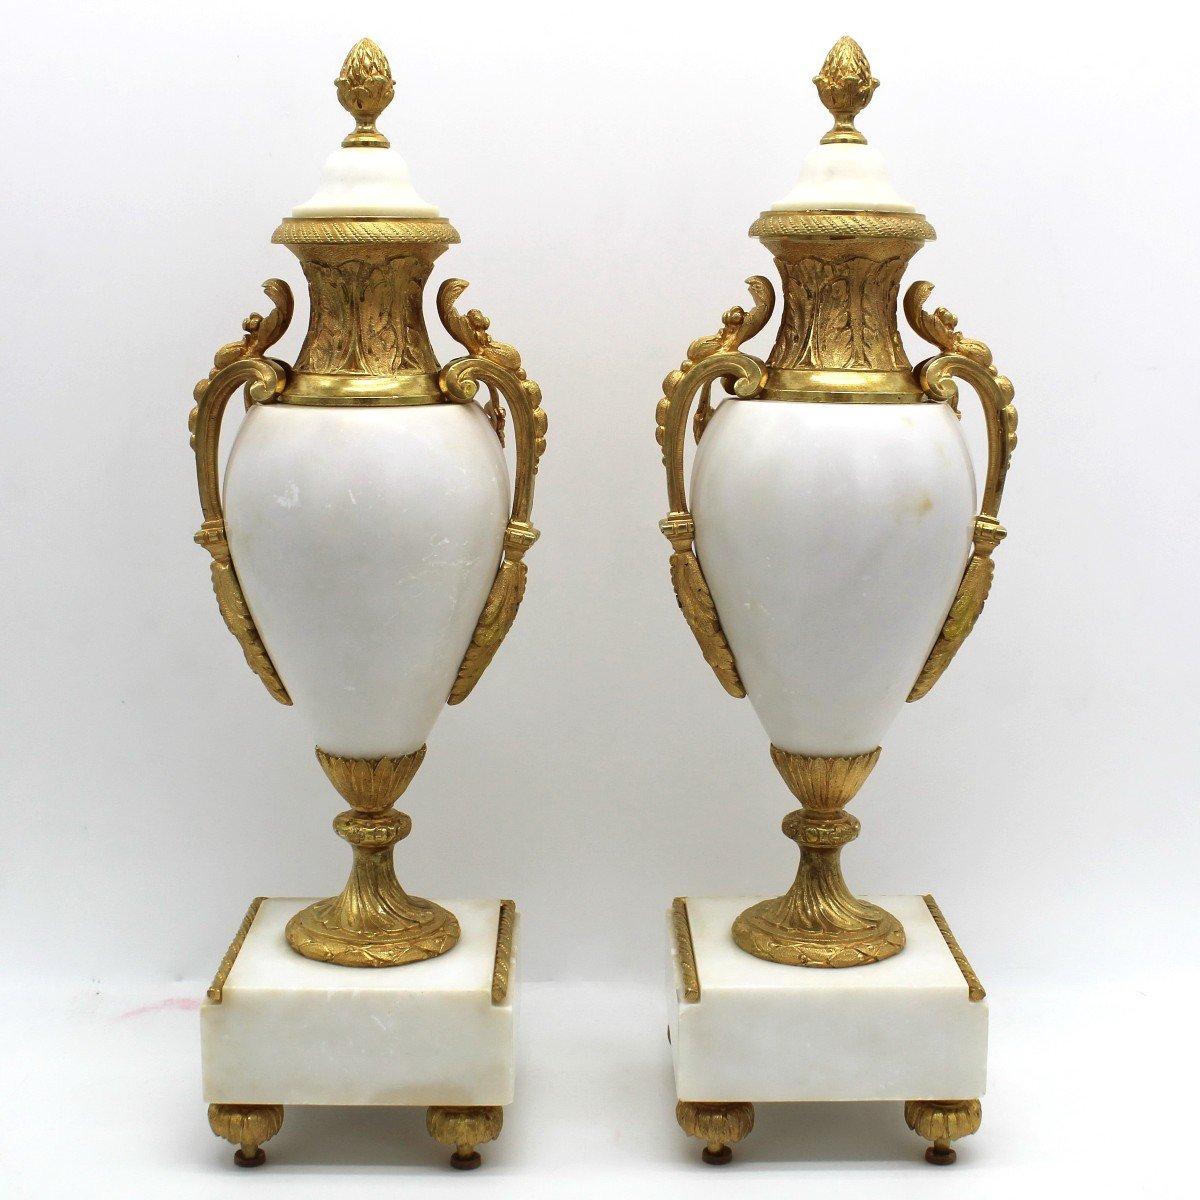 Antique Pair Of Napoleon III Cassolette Vases In Gilt Bronze - 19th-photo-2